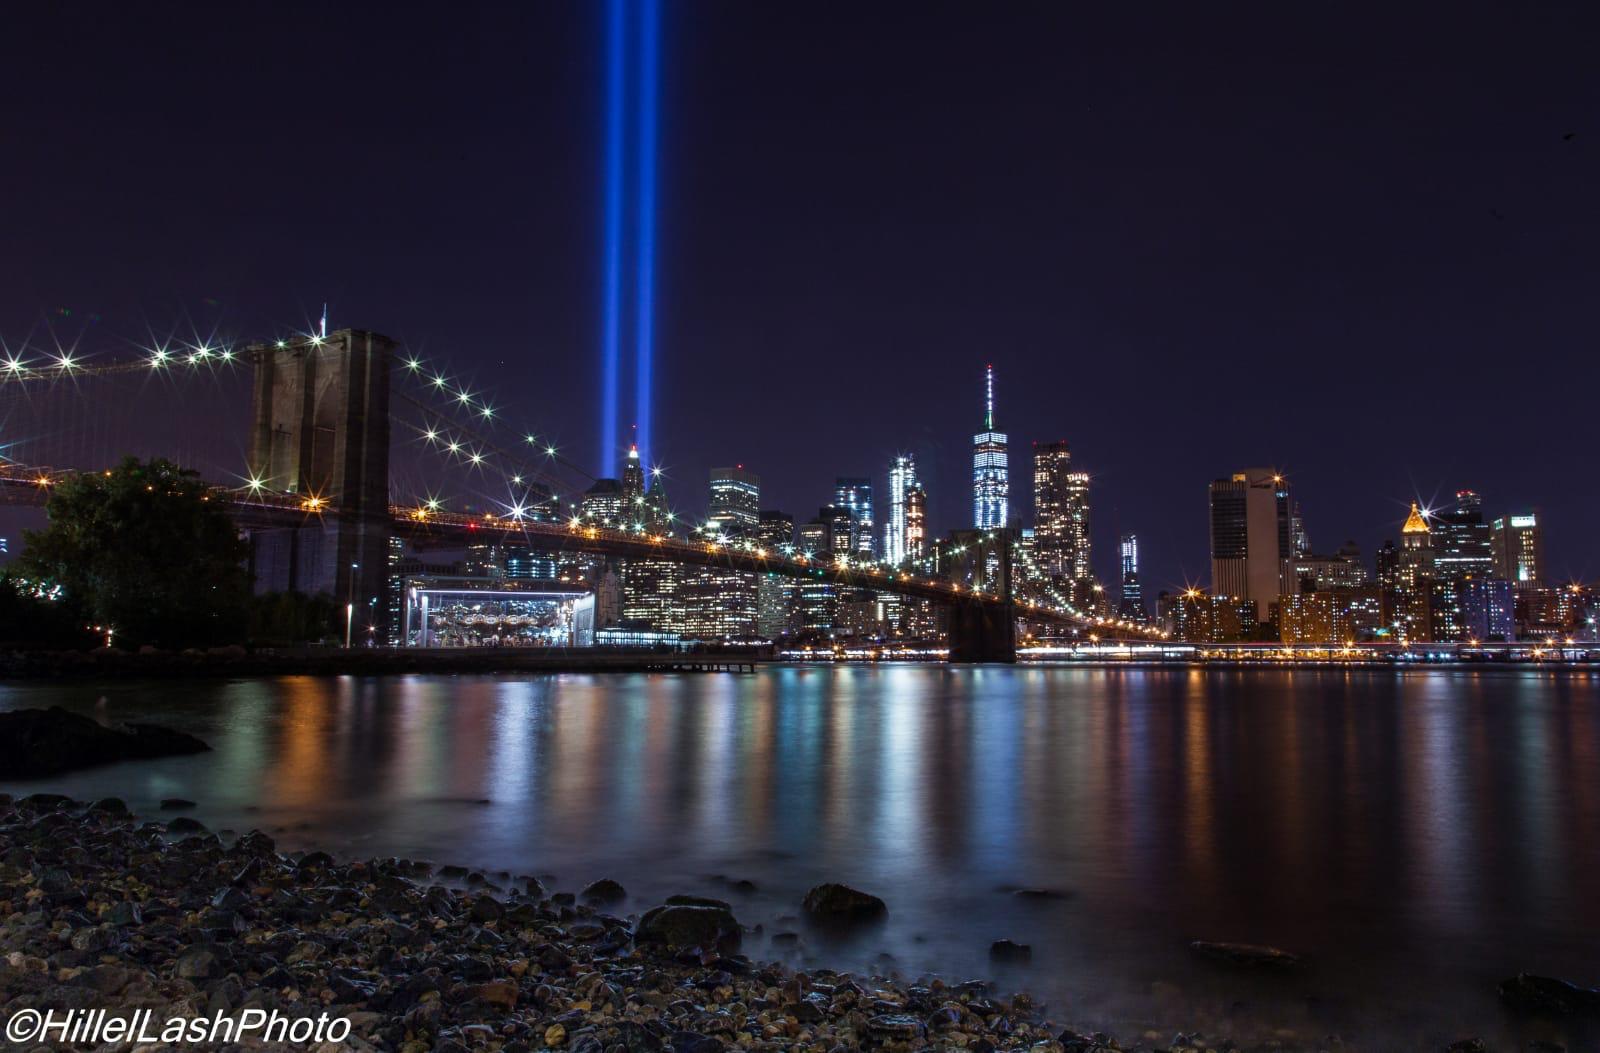 New York City Marks 19 Years Since 9/11 Terrorist Attacks